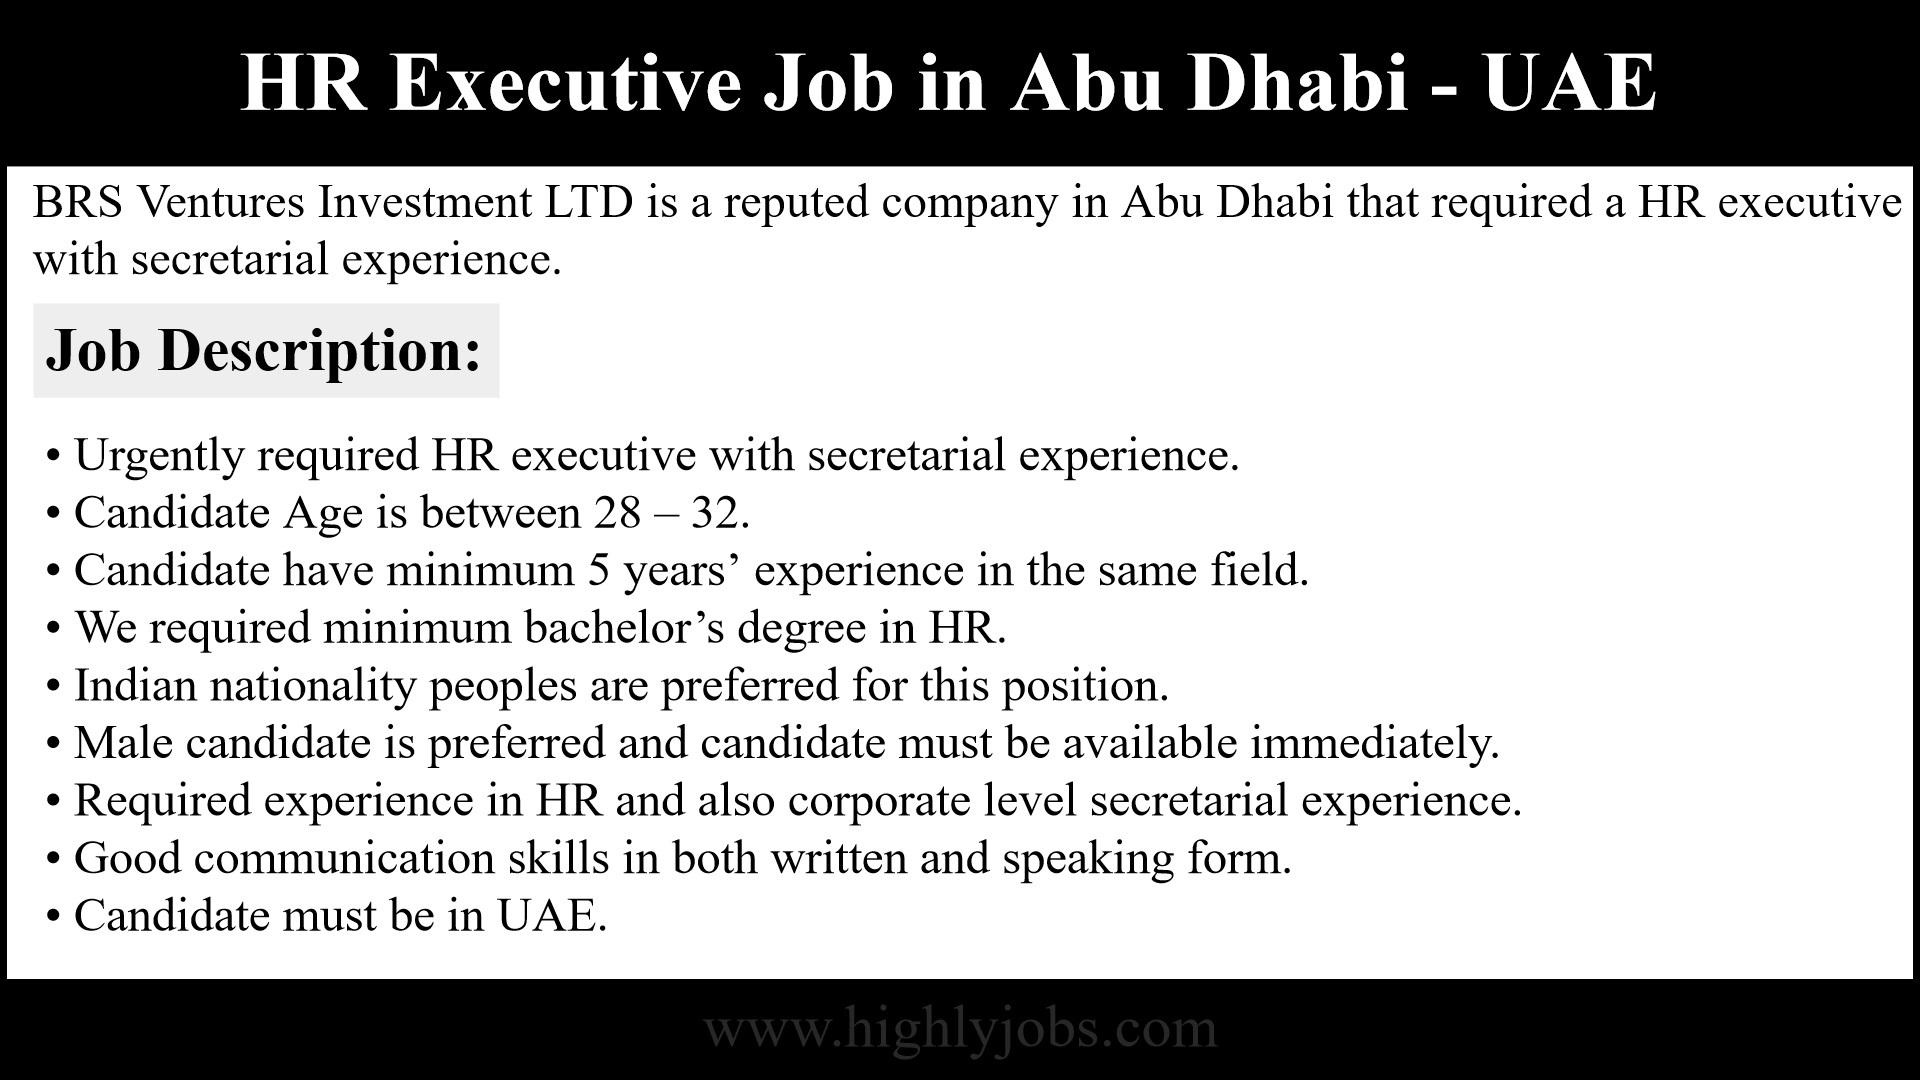 HR Executive Job in Abu Dhabi | Highlyjobs